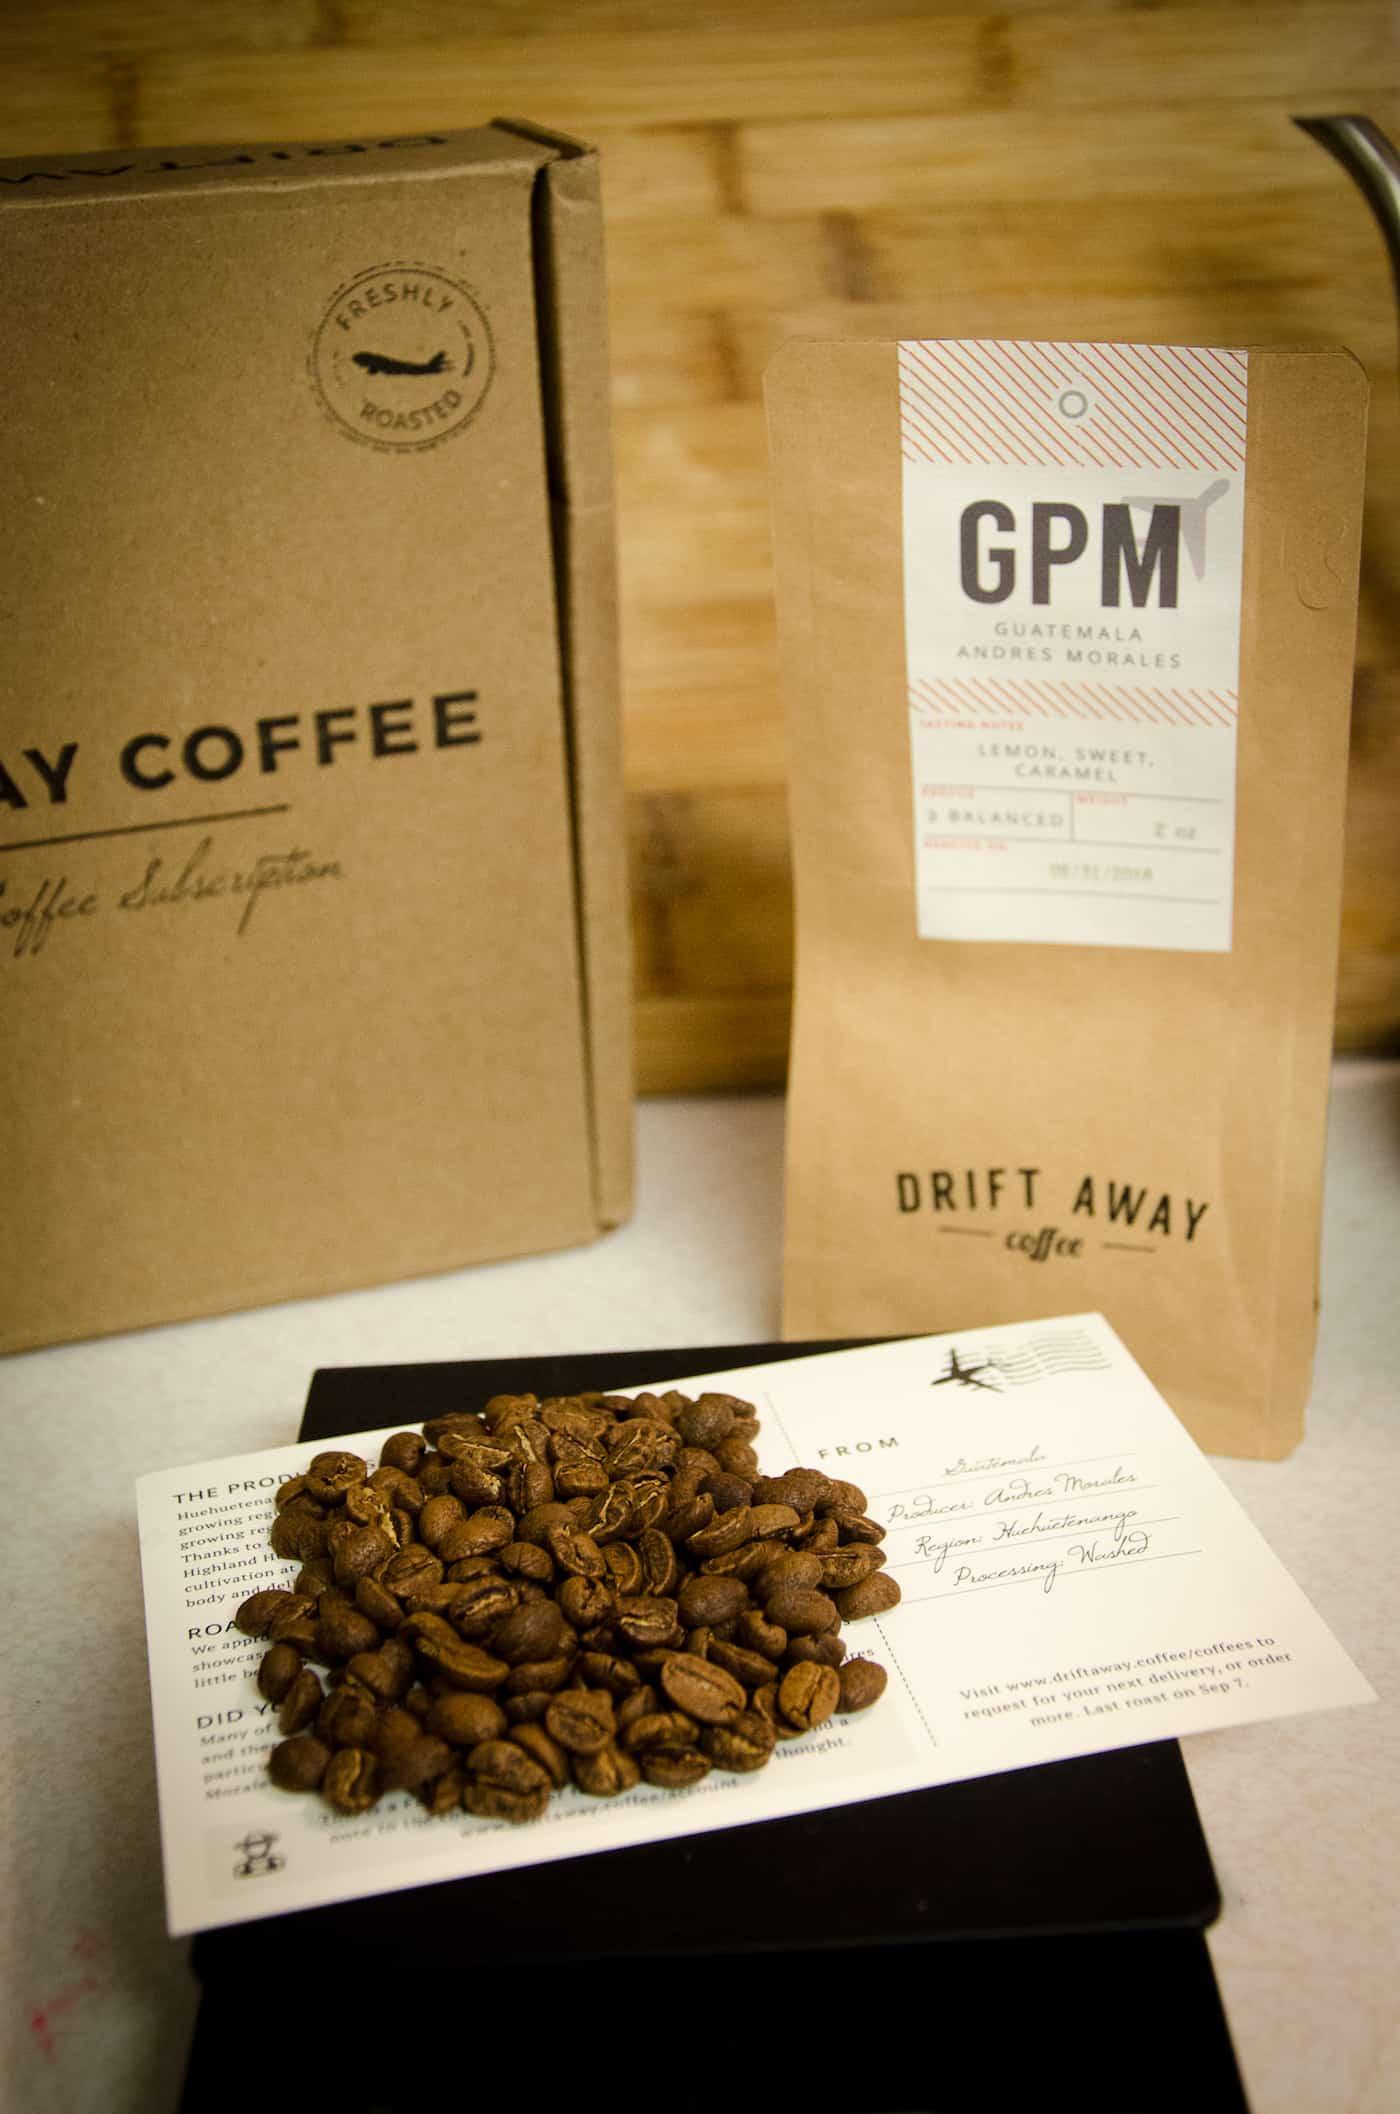 Driftaway coffee beans